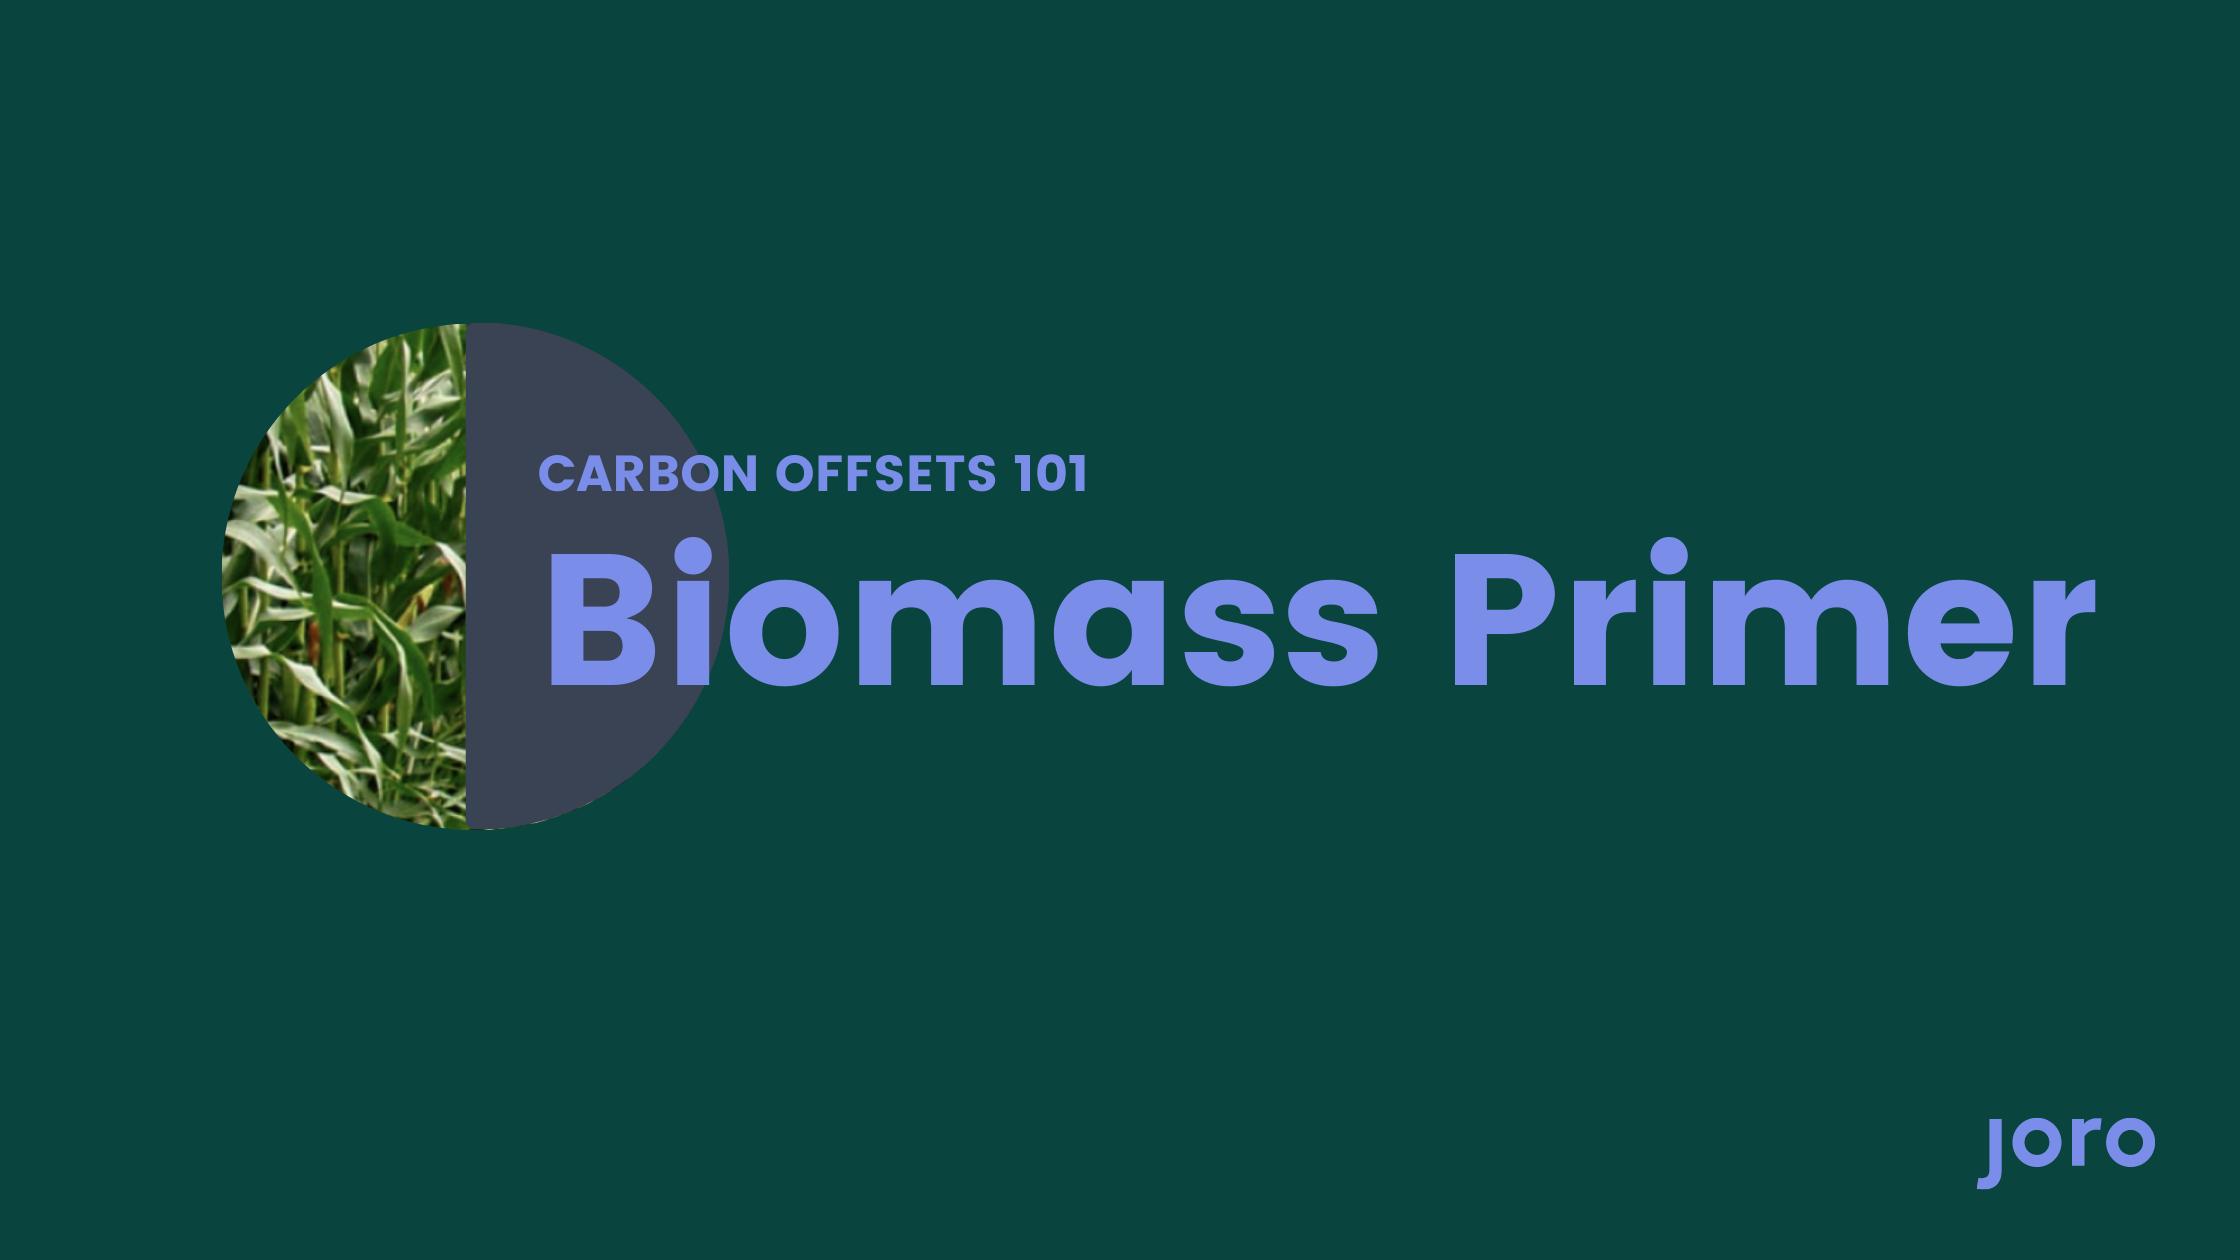 Carbon Offsets 101: Biomass Primer